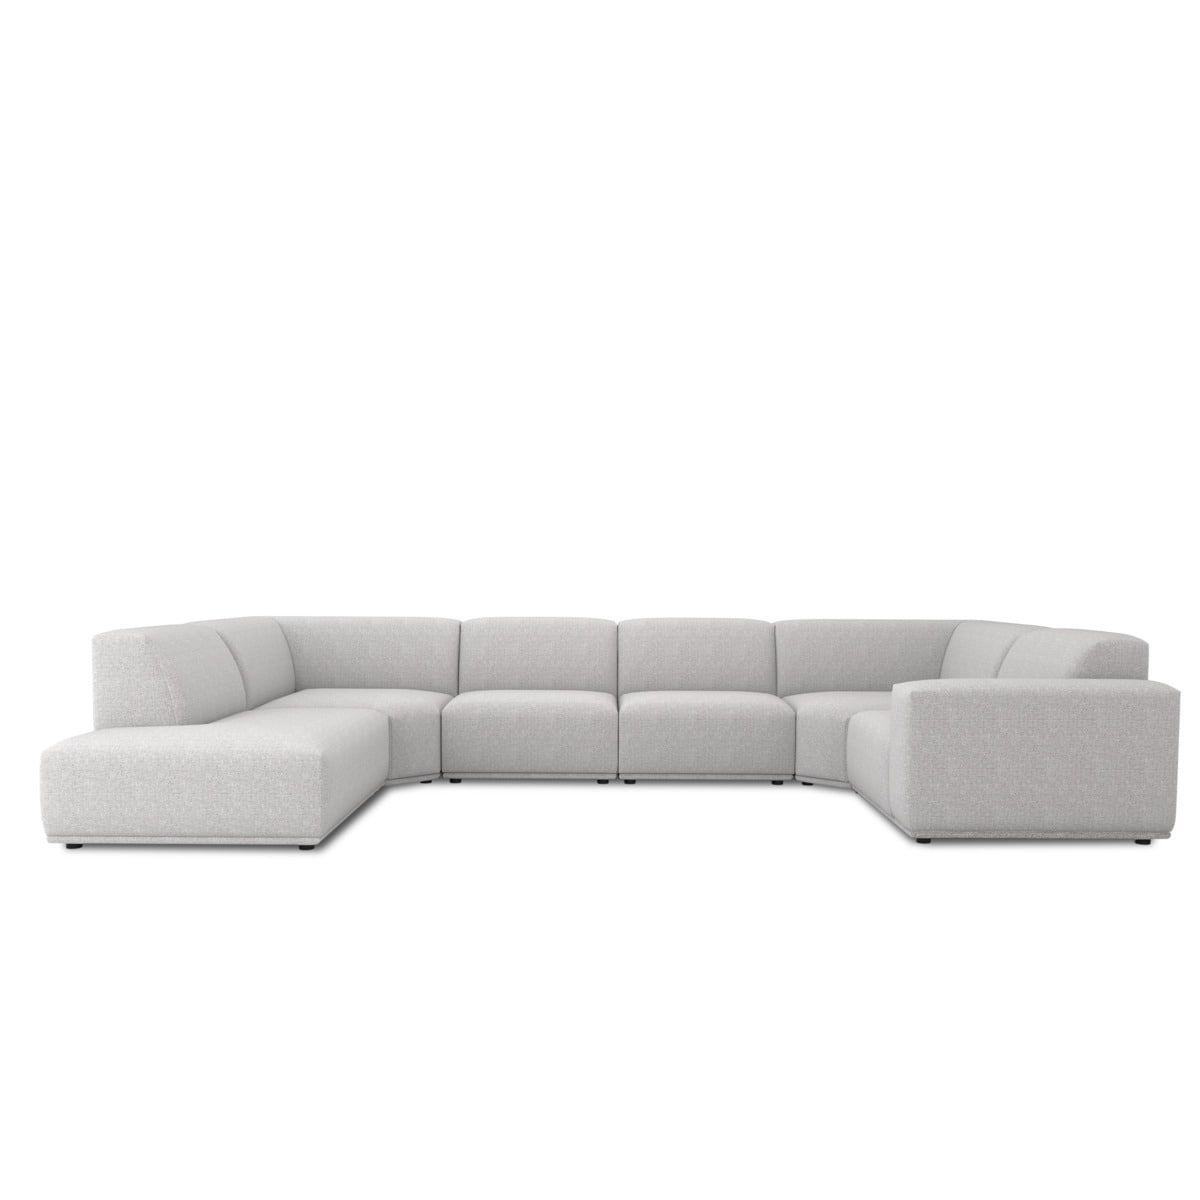 Todd U Shape Sectional Sofa With Chaise Left Hand Facing Light Grey U Shaped Sectional Sofa Sectional Sofa With Chaise U Shaped Sectional